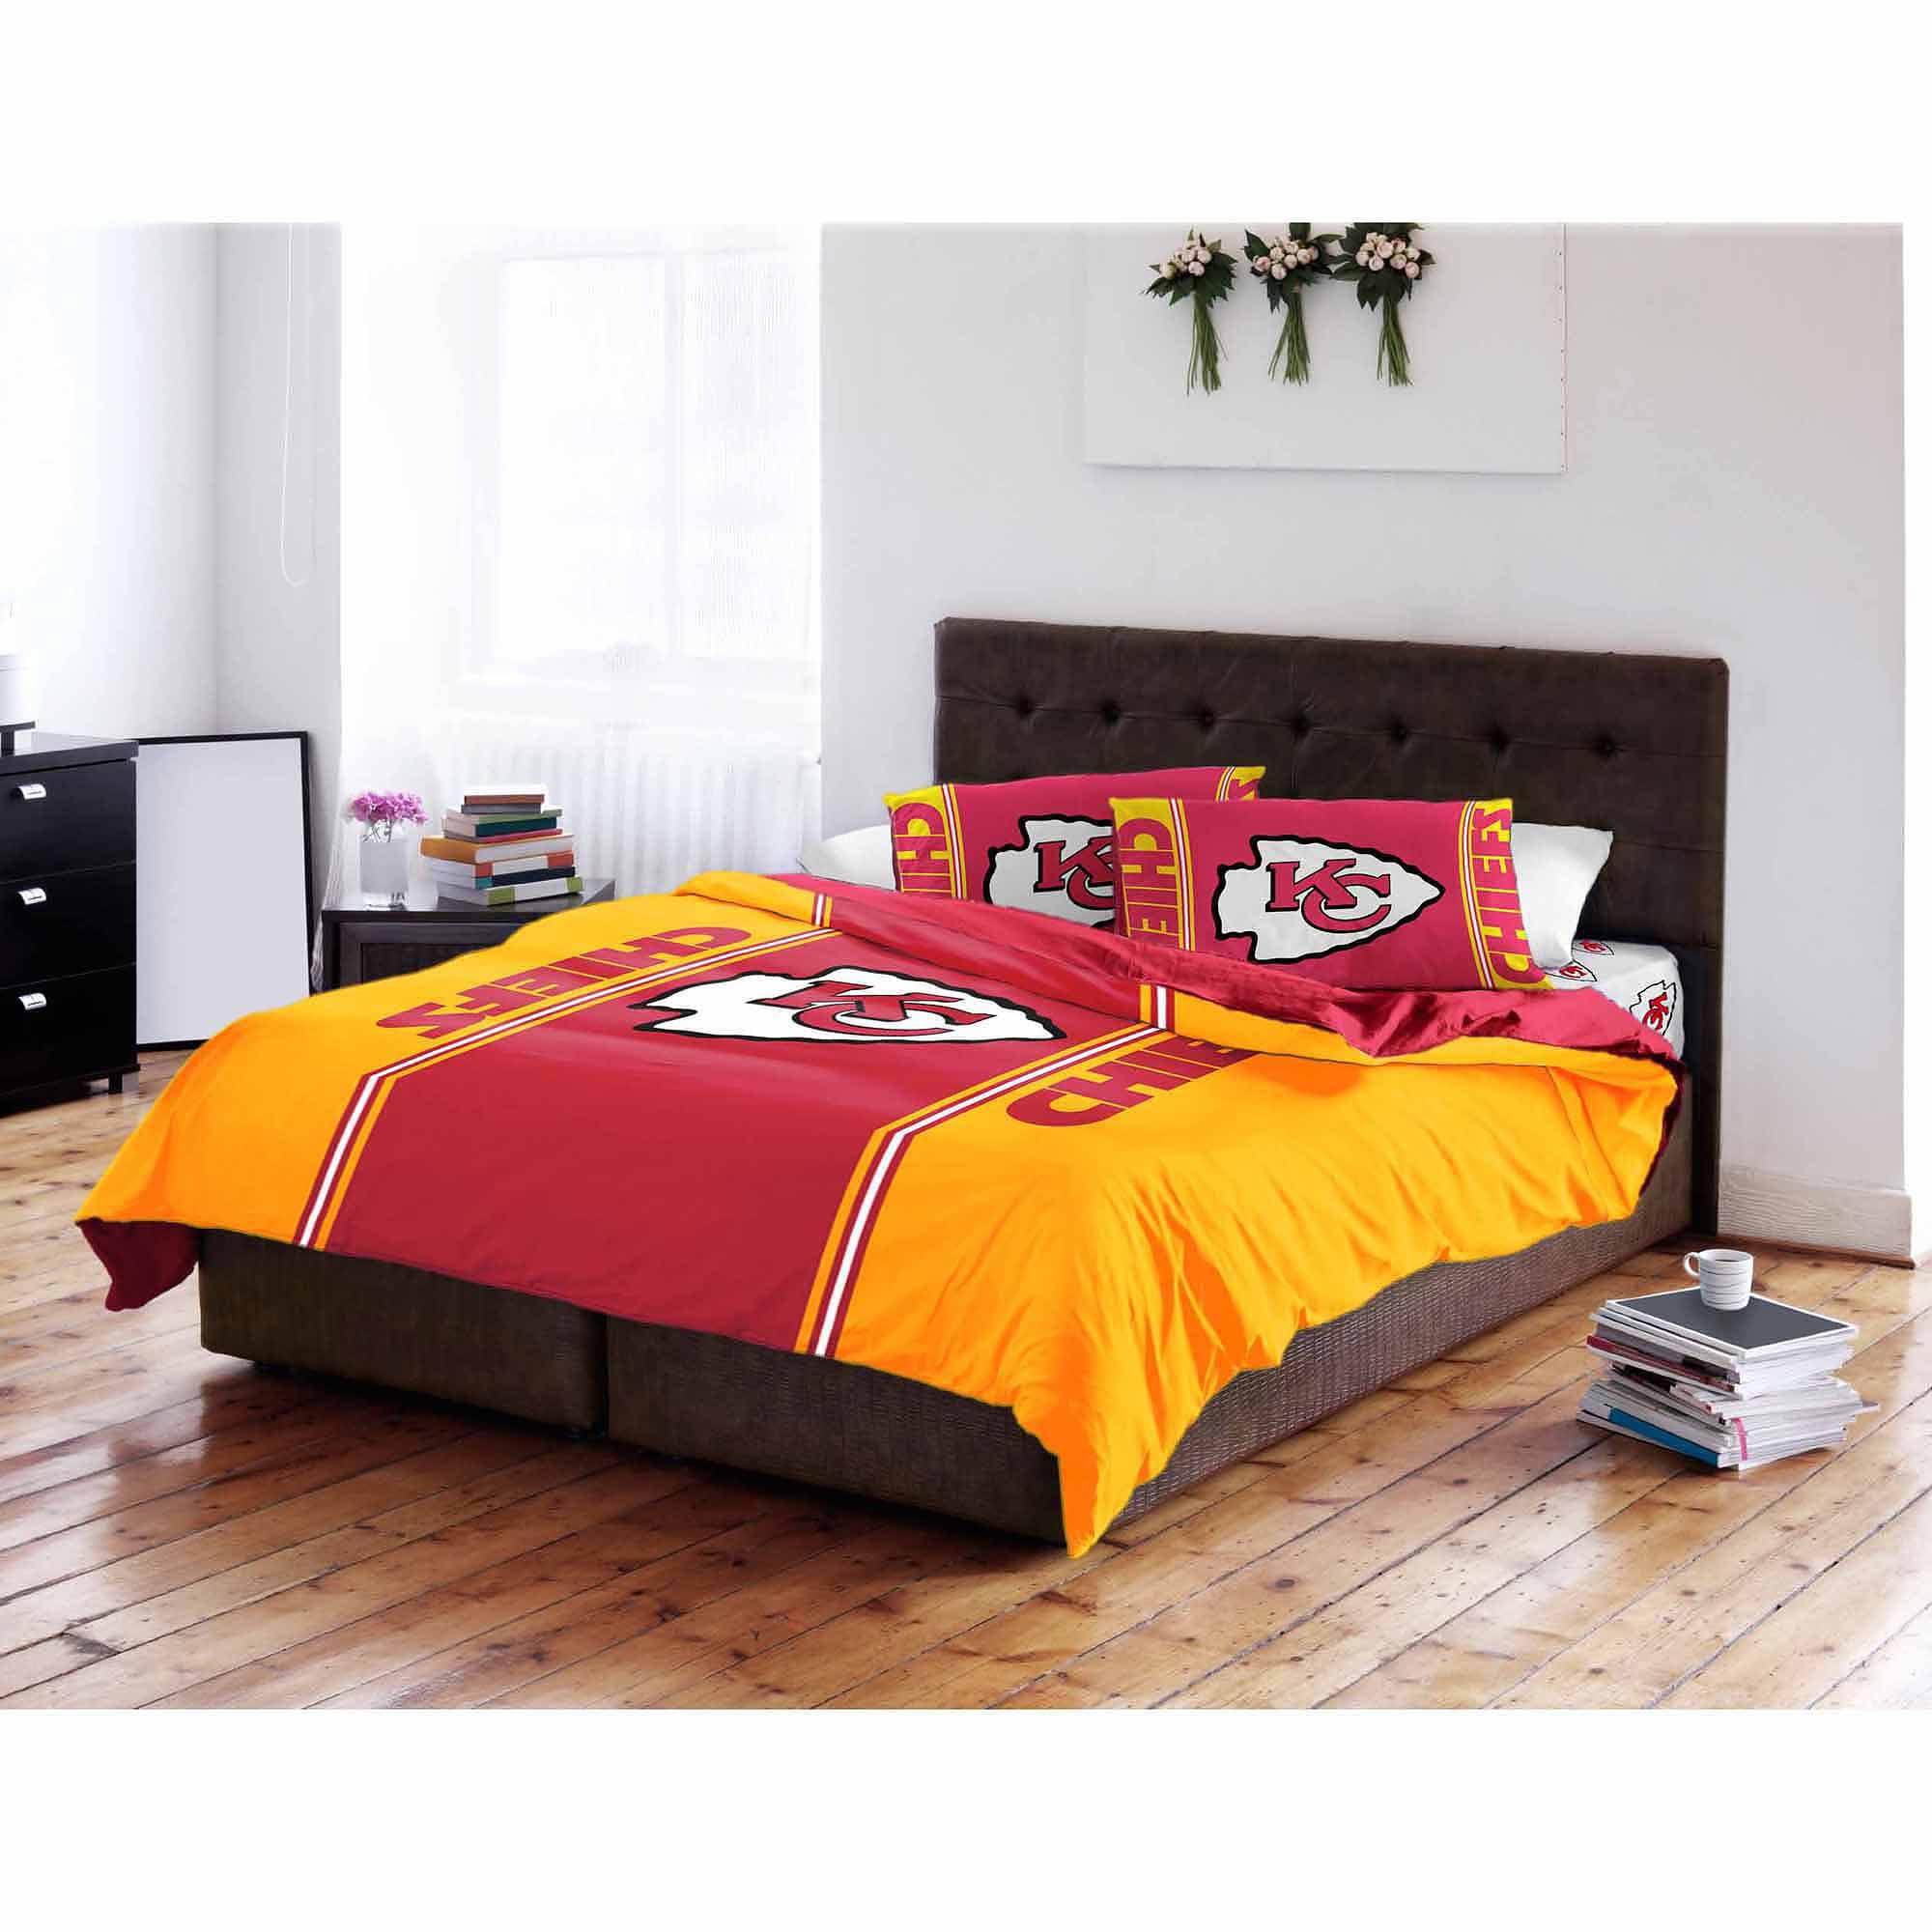 NFL Kansas City Chiefs Twin/Full Bedding Comforter